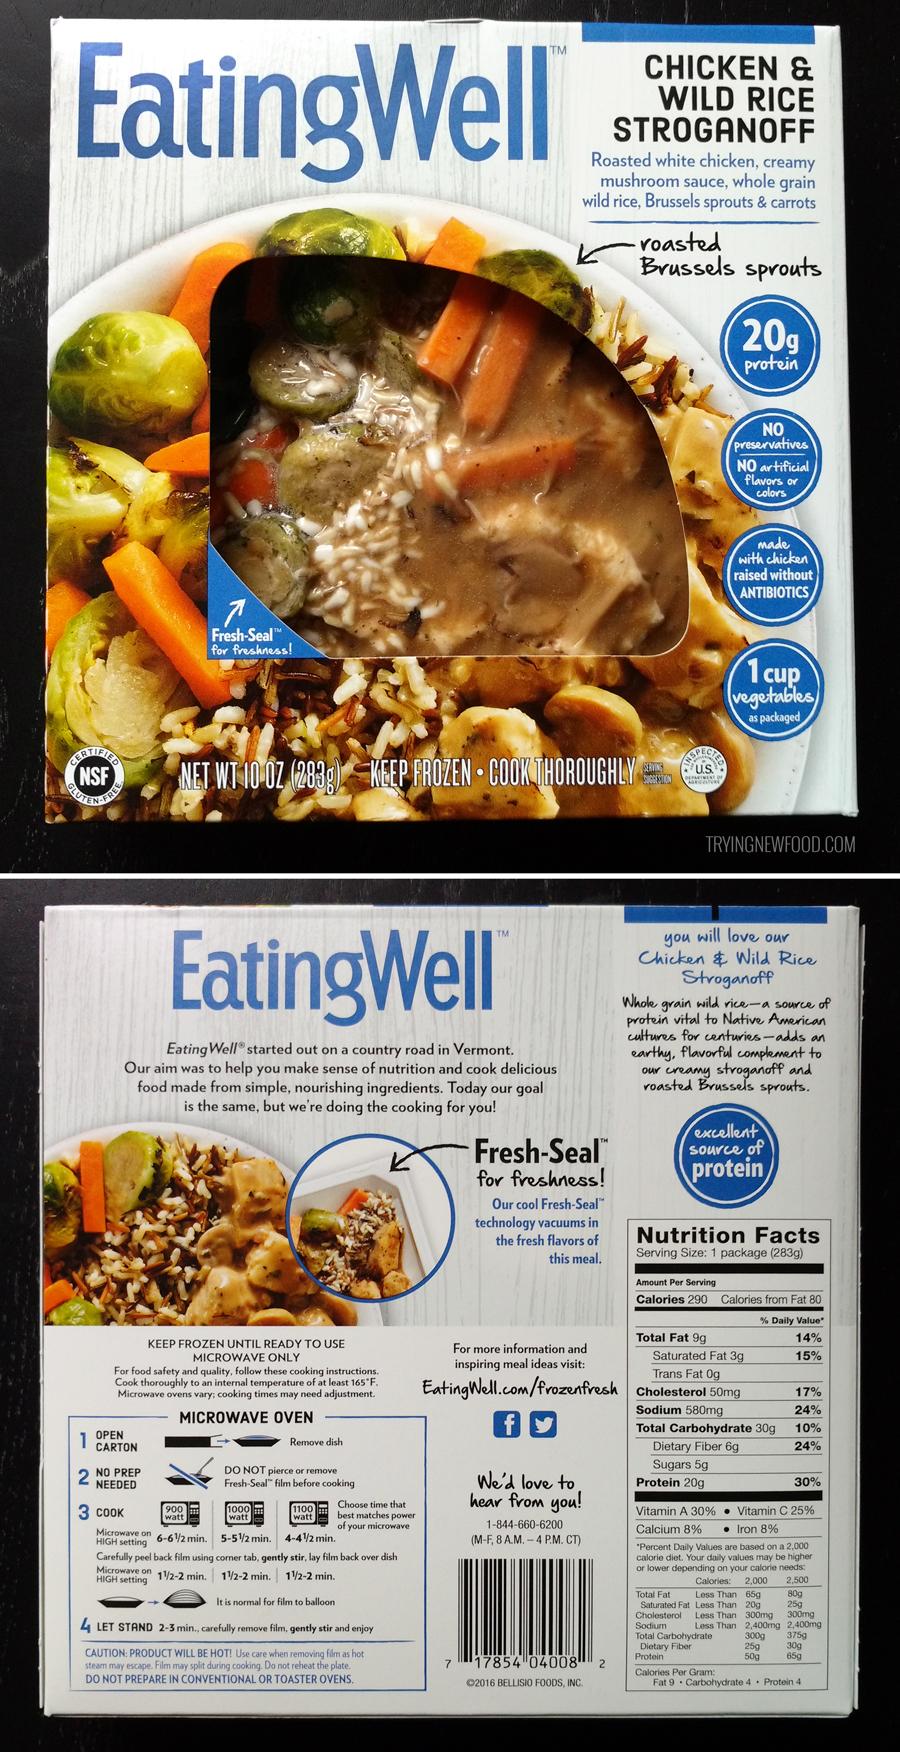 EatingWell Chicken & Wild Rice Stroganoff packaging